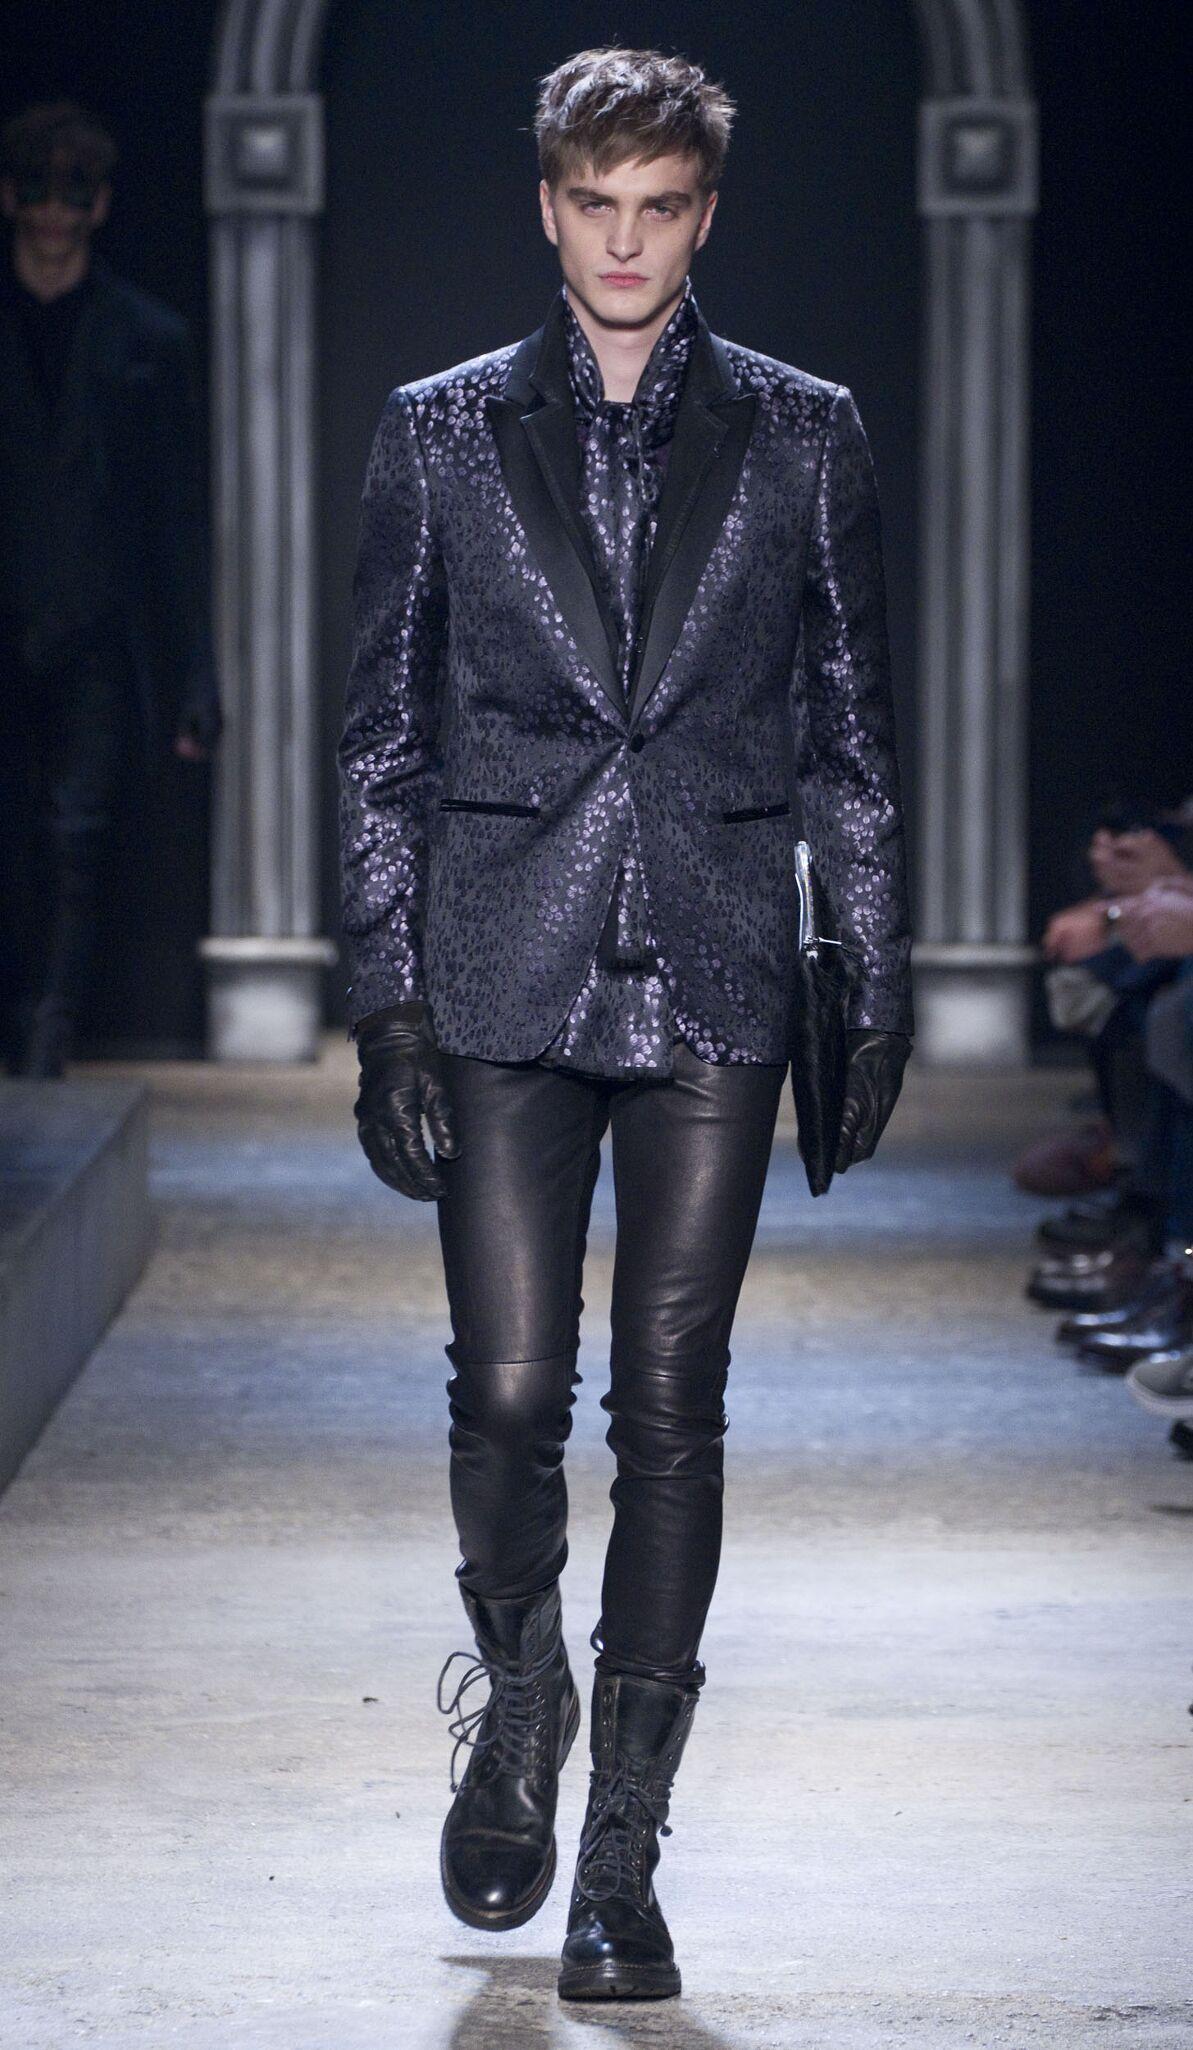 Fall Winter 2014 15 Fashion Men's Collection John Varvatos